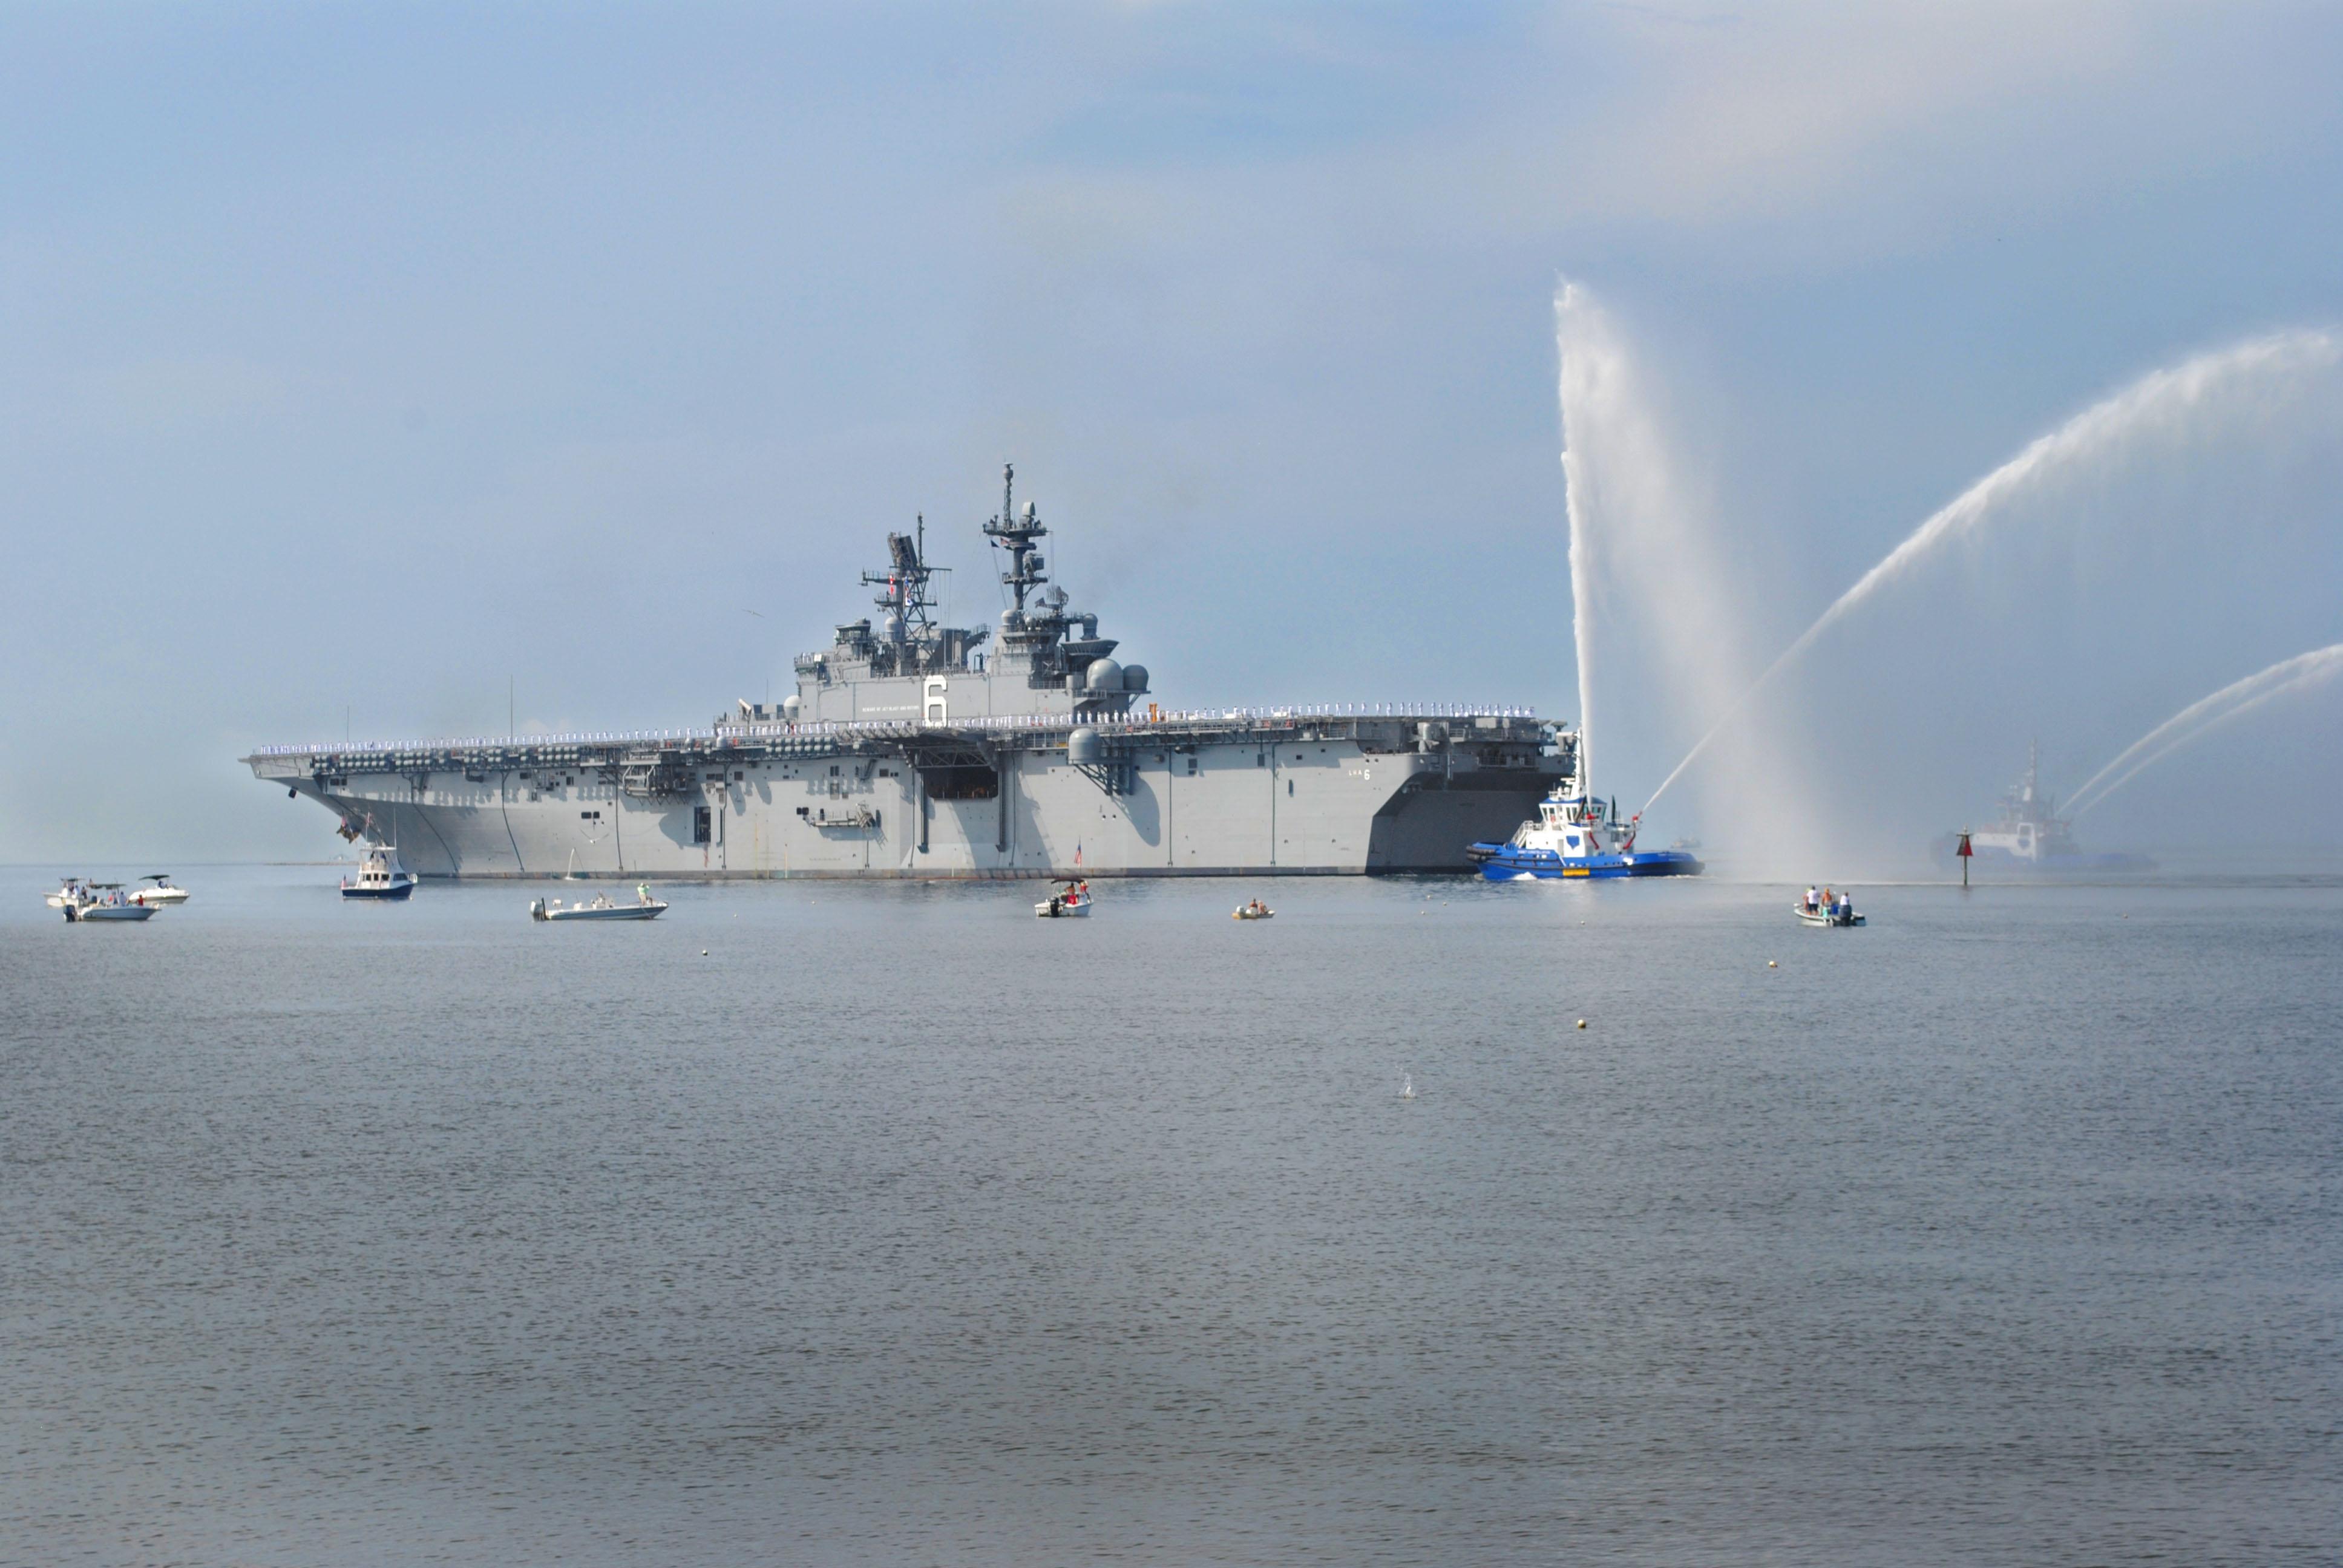 USS AMERICA LHA-6 Auslaufen Pascagoula am 11.07.2014 Bild: Huntington Ingalls Shipbuilding